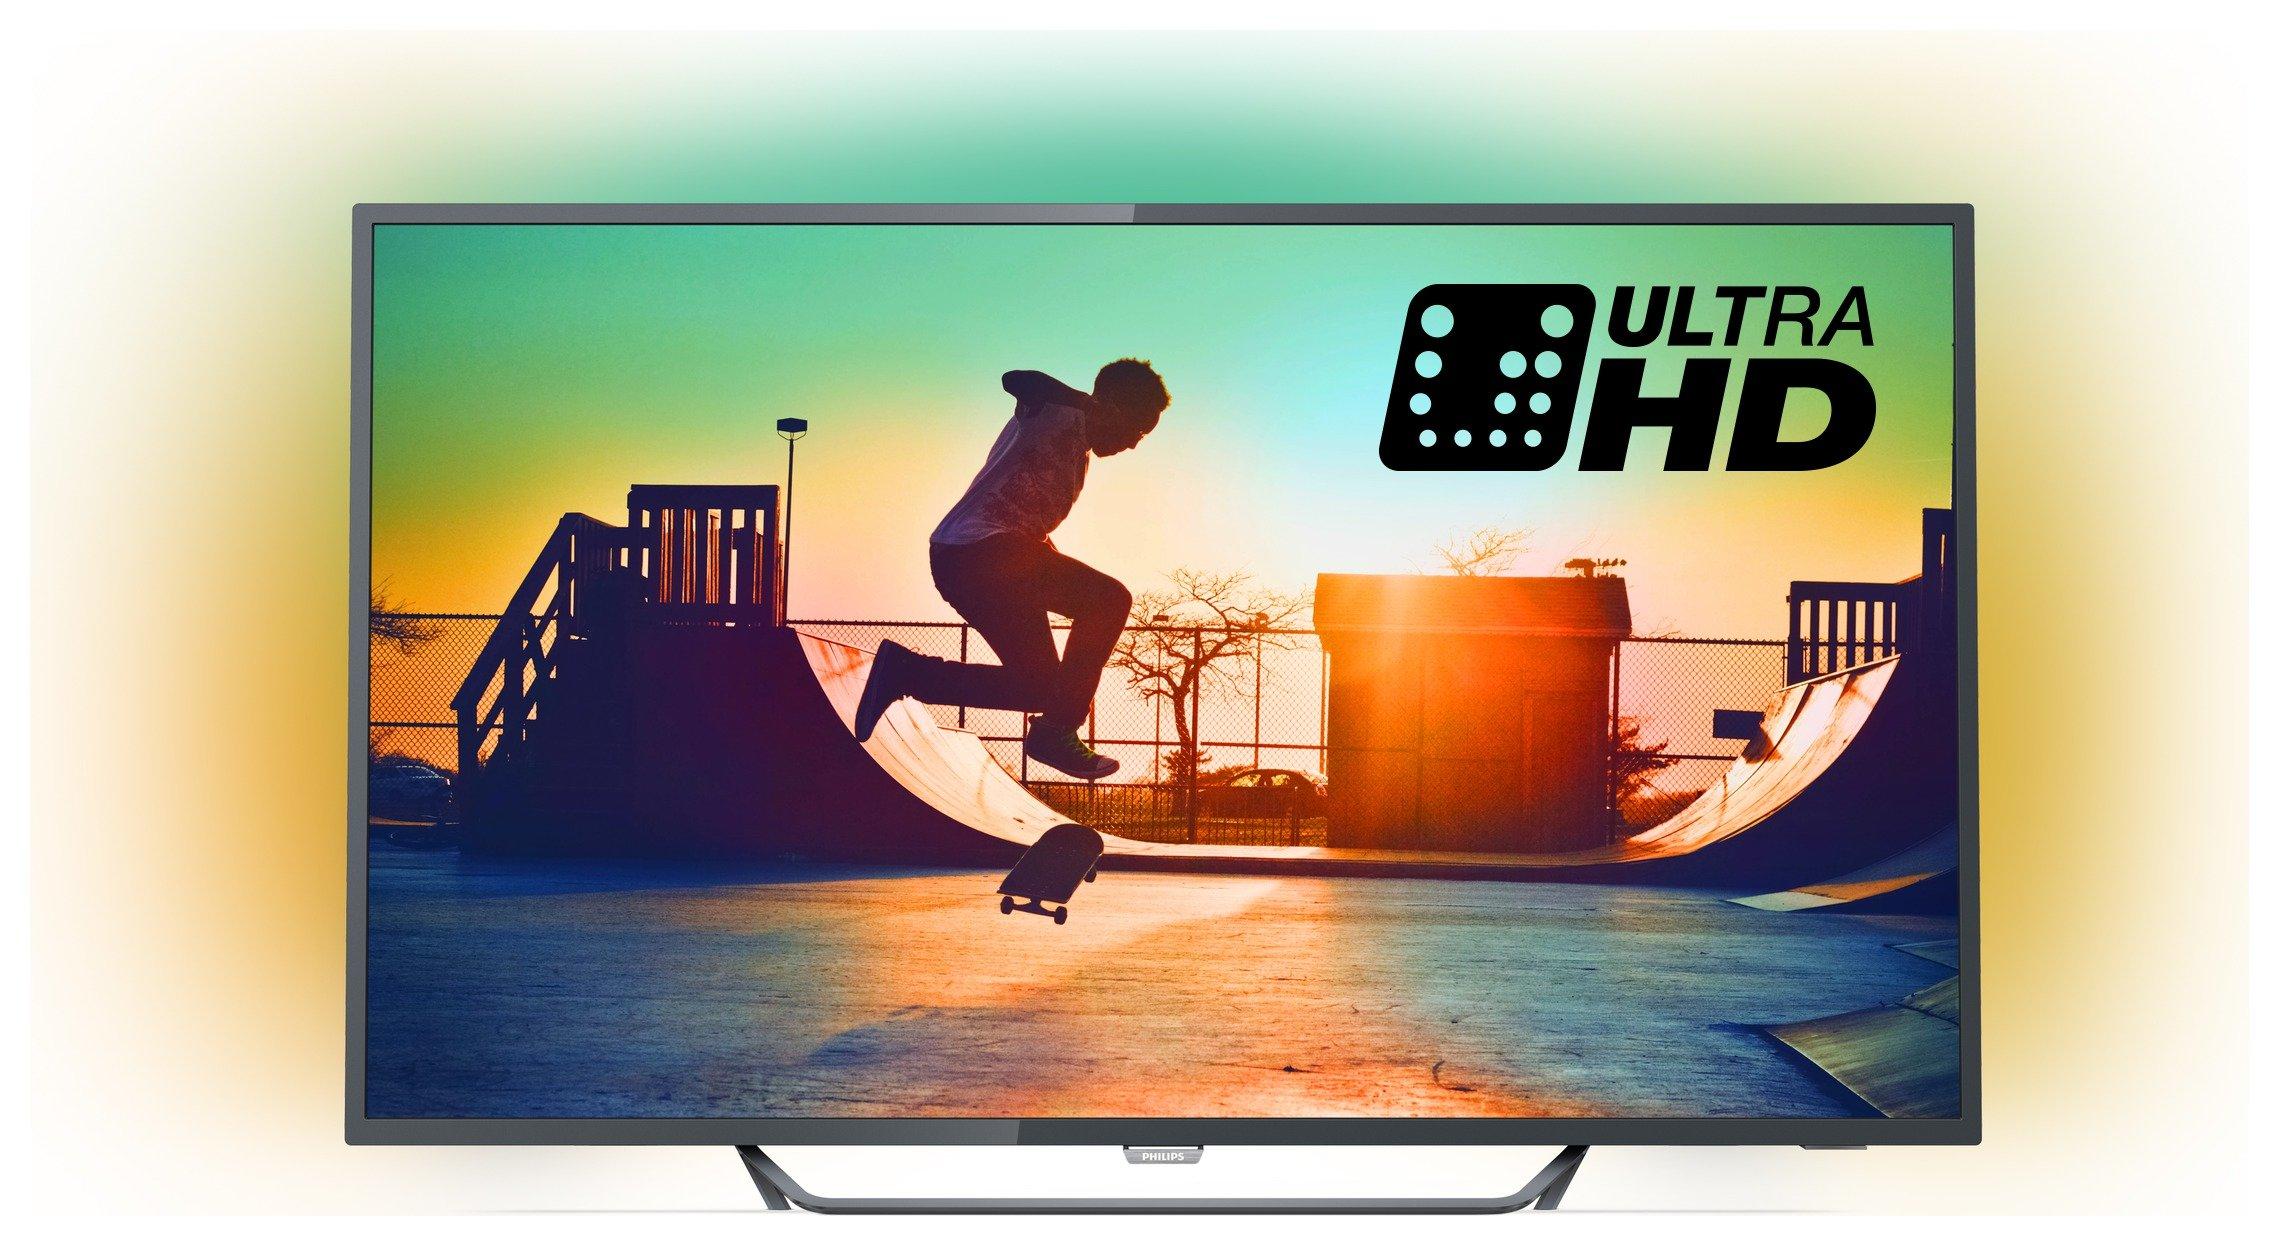 hitachi 65hl6t64u 65 inch 4k ultra hd smart tv. philips 65pus6262 65 inch 4k uhd hdr ambilight smart tv hitachi 65hl6t64u 4k ultra hd tv k